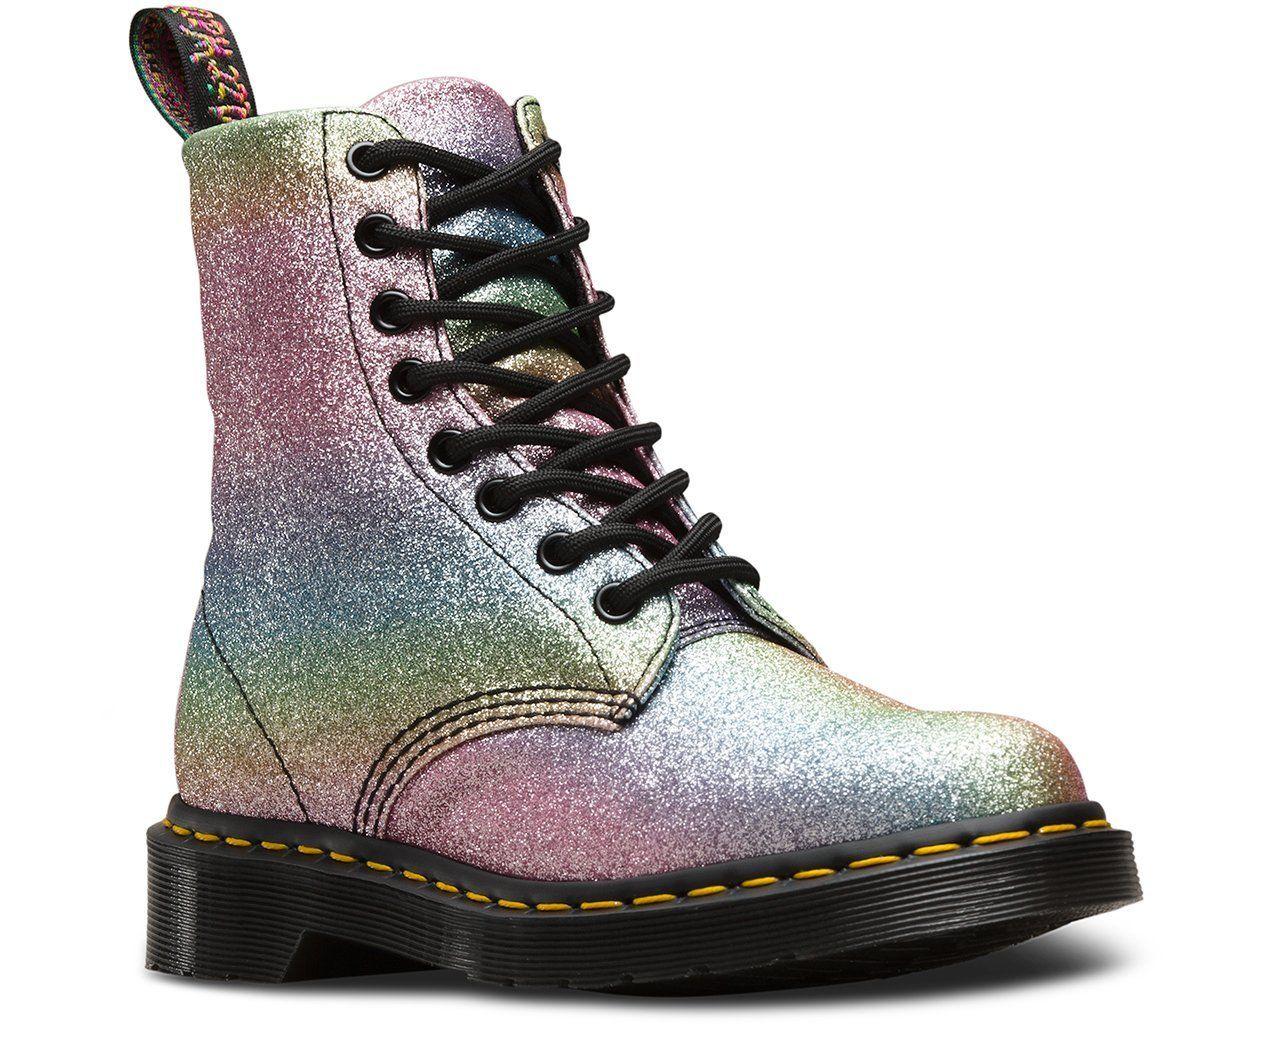 Dr. Martens Glitter Boots   POPSUGAR Fashion